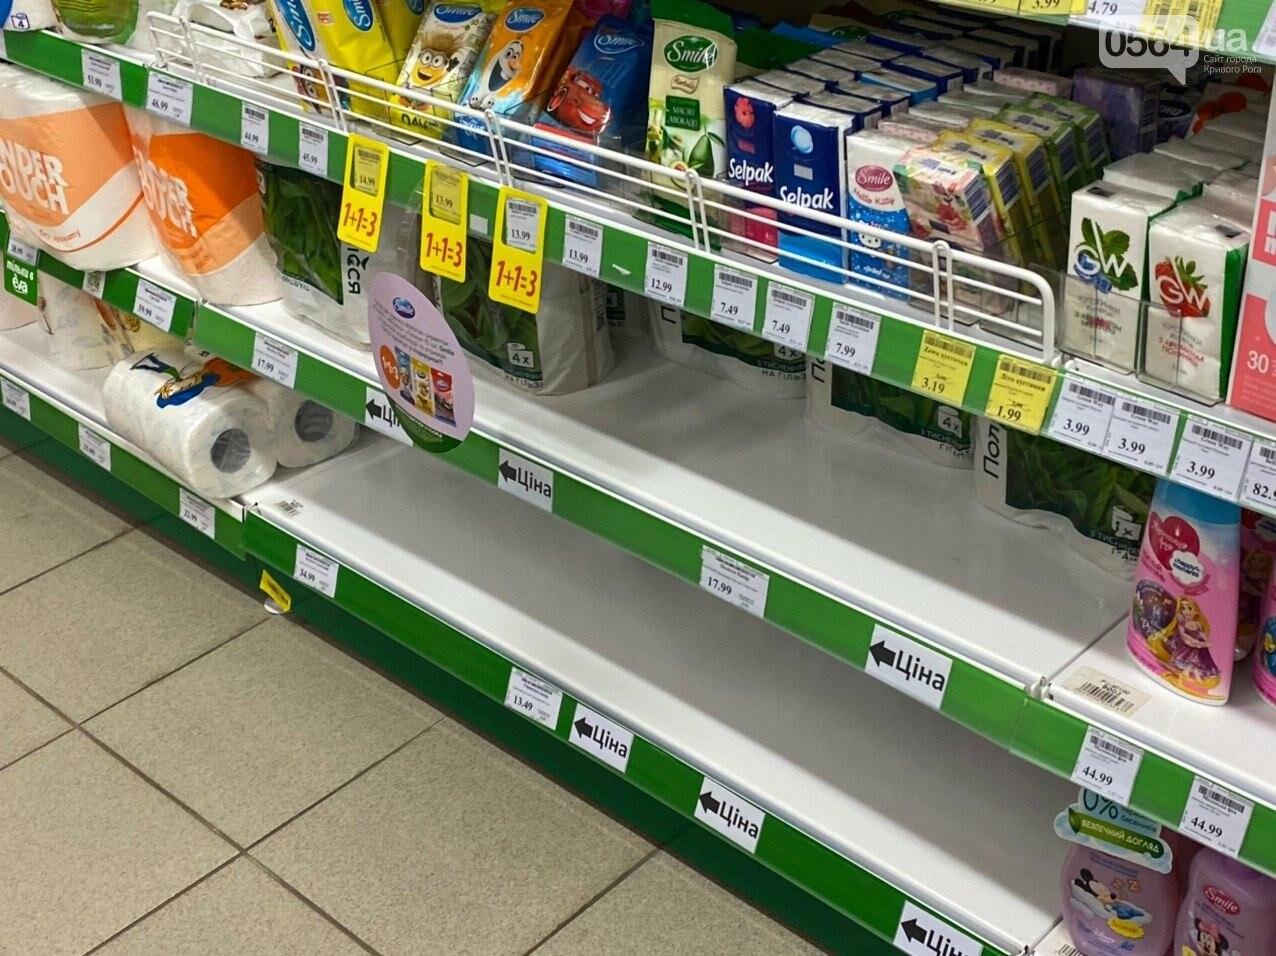 Туалетная бумага и гречка: что скупают криворожане во время карантина, - ФОТО , фото-9